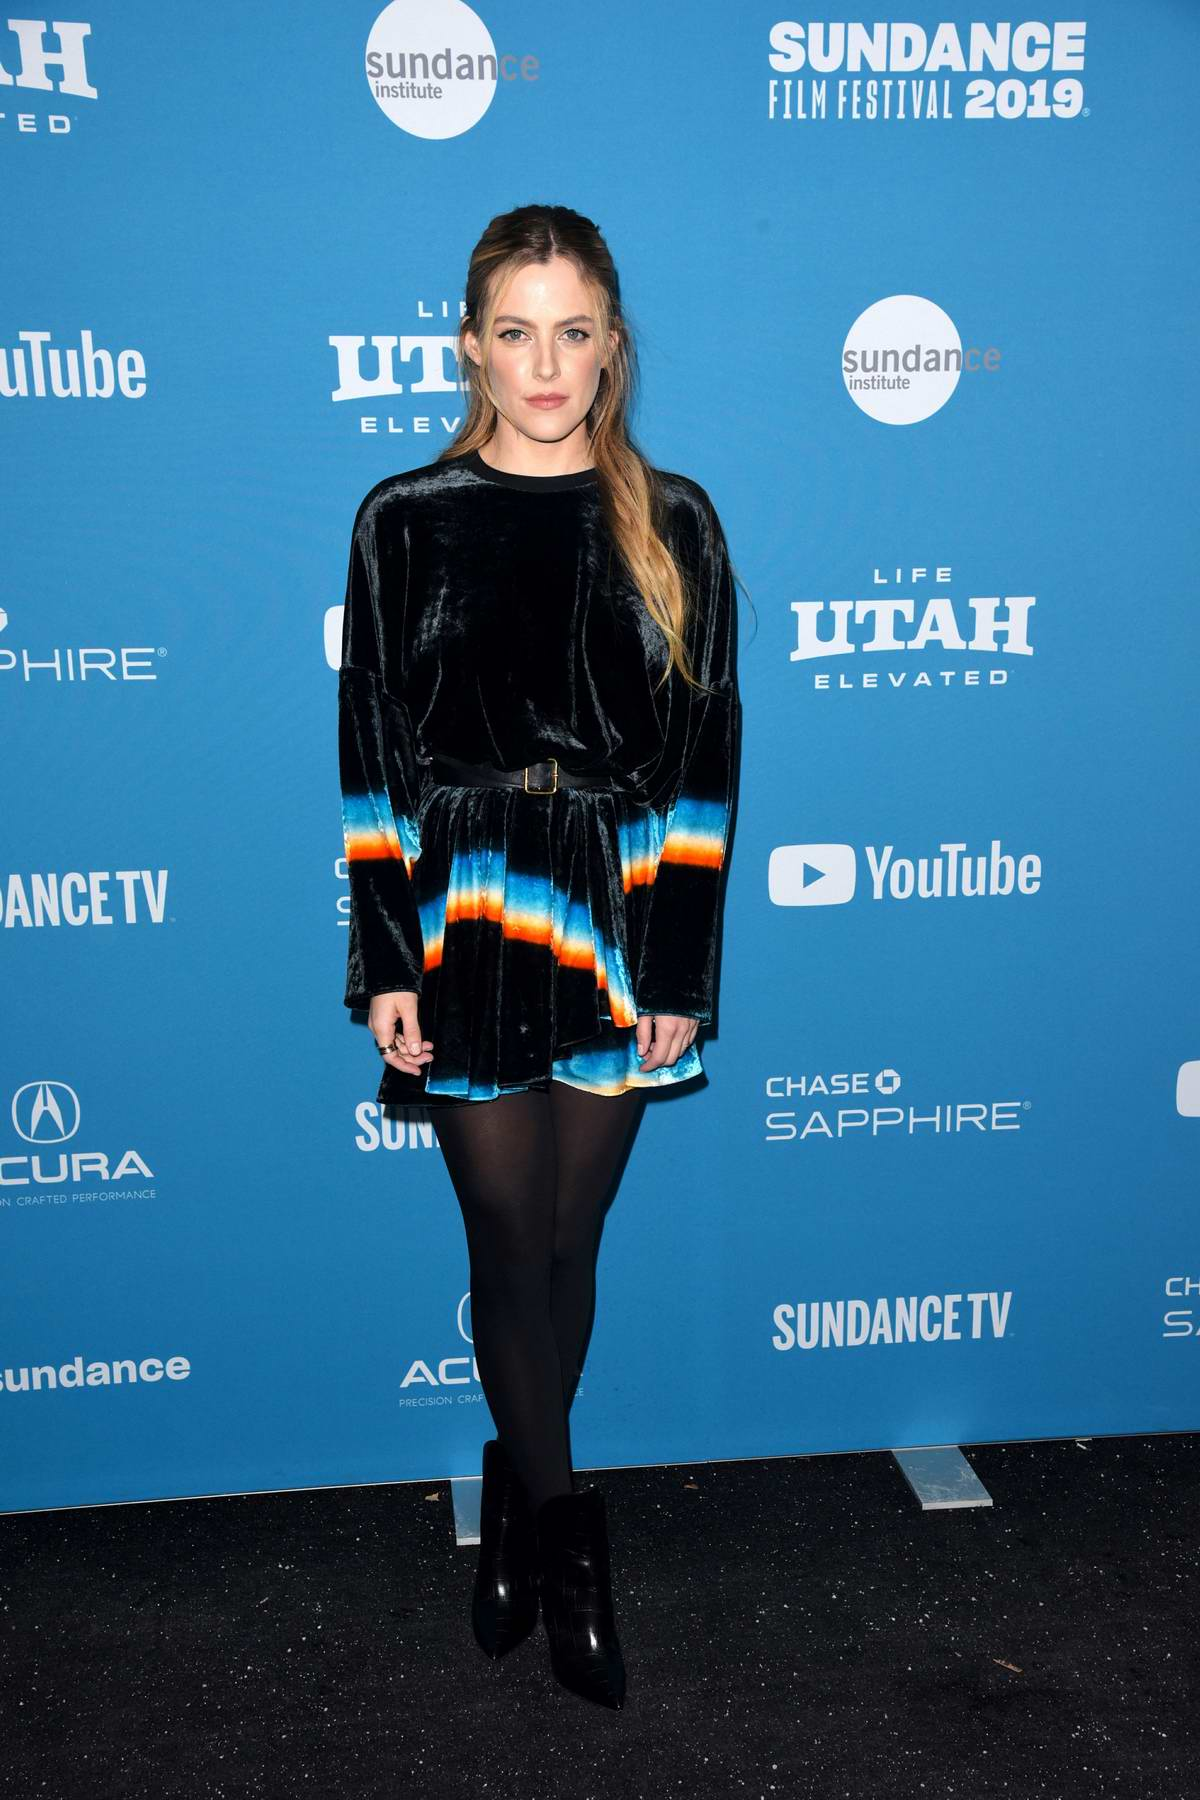 Riley Keough attends 'The Lodge' premiere at Sundance Film Festival in Park City, Utah